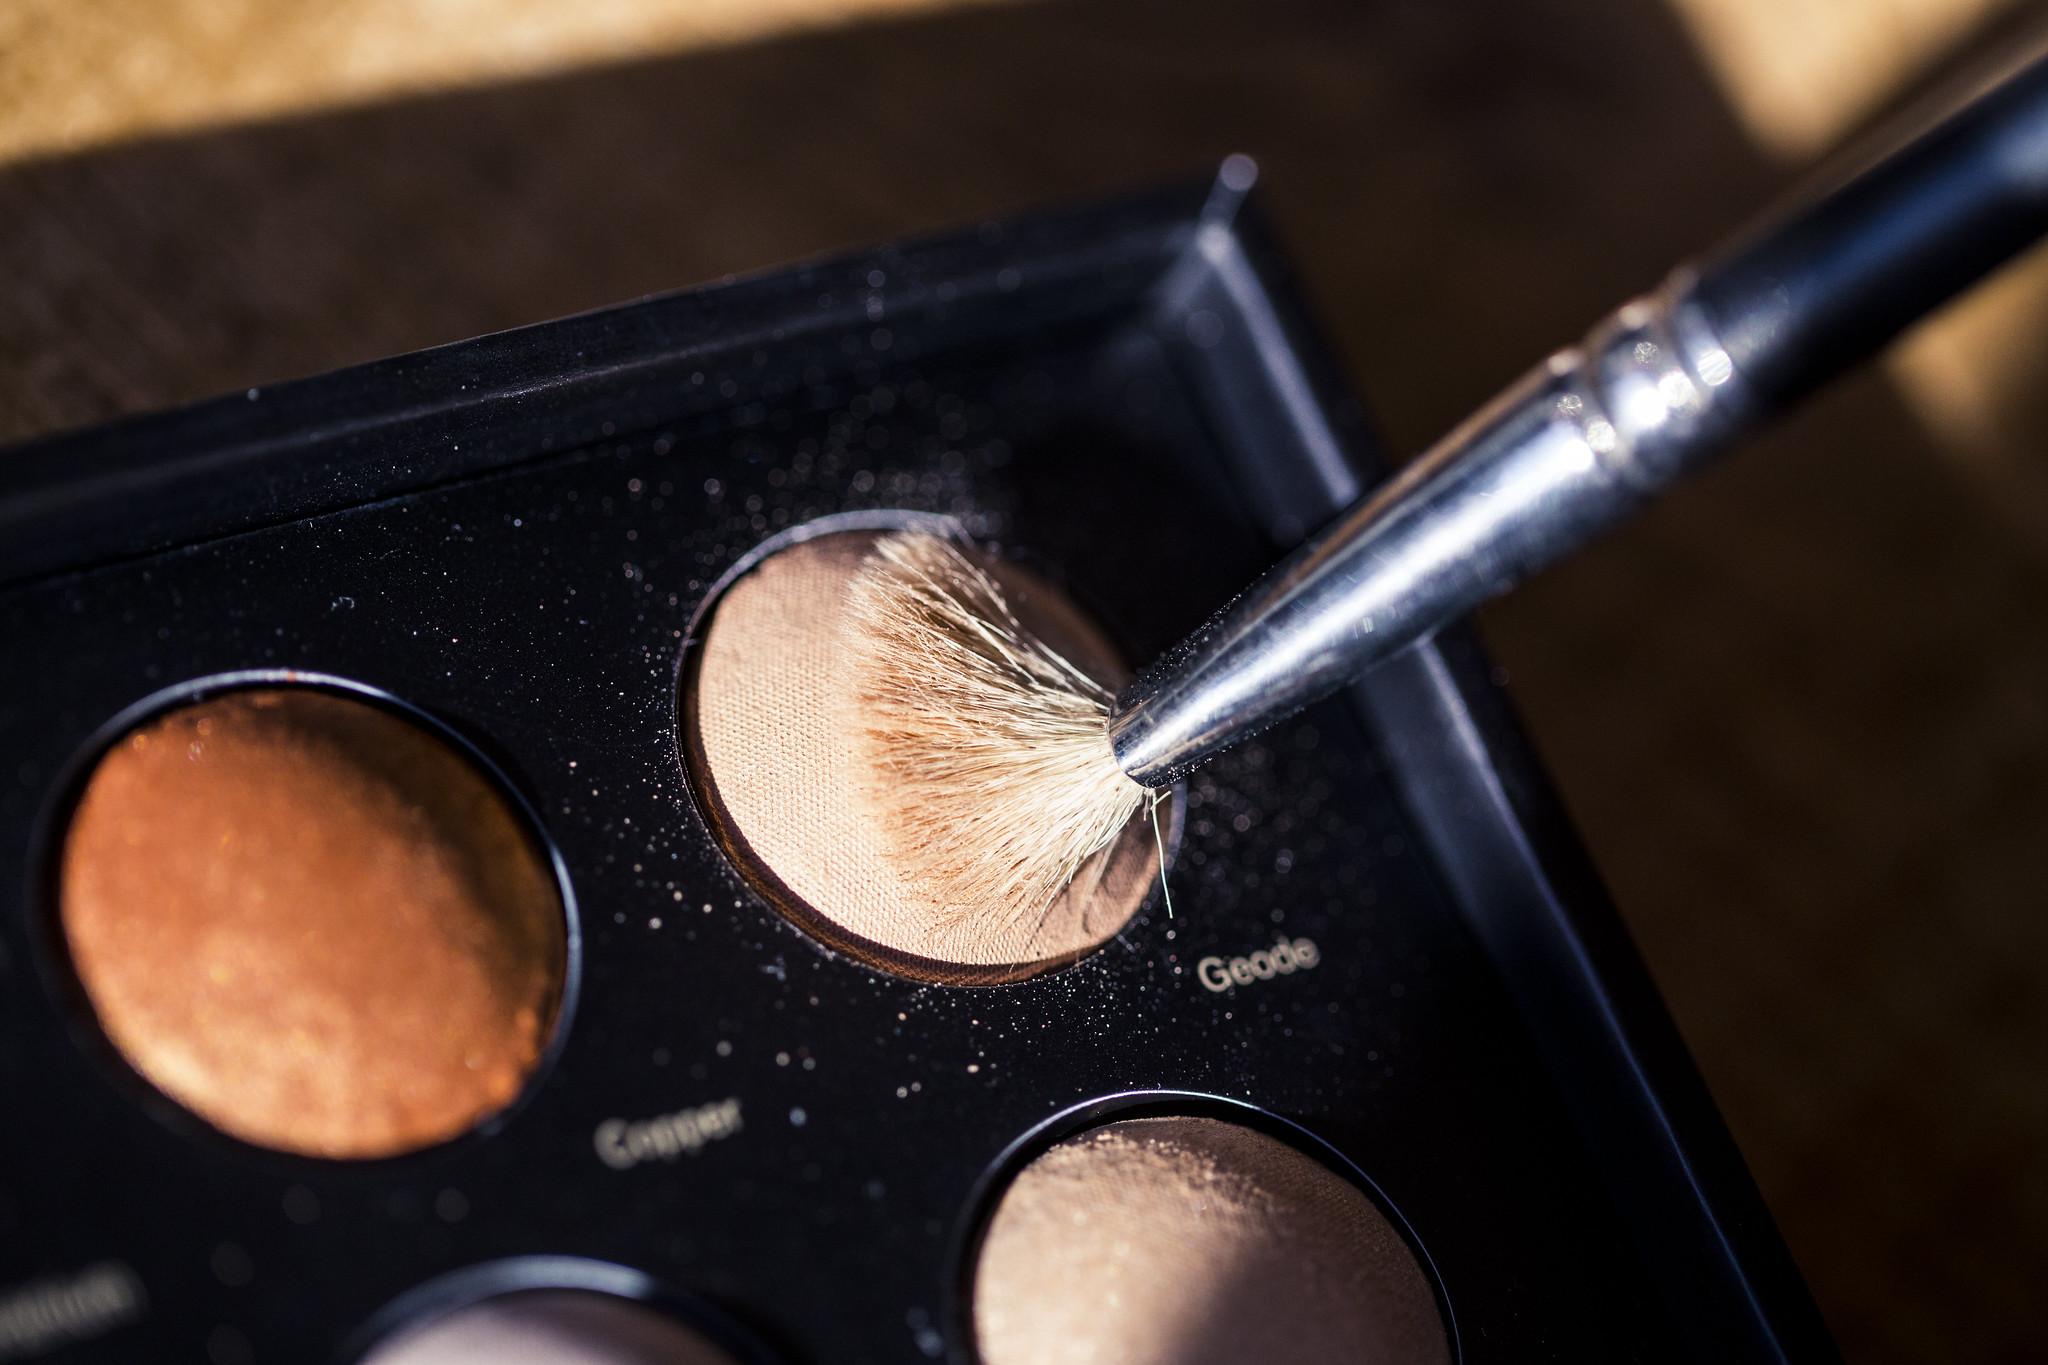 tutomakeup1_tom_012815__2 tutomakeup1_tom_012815_ - Prix Maquillage Mariage Sephora